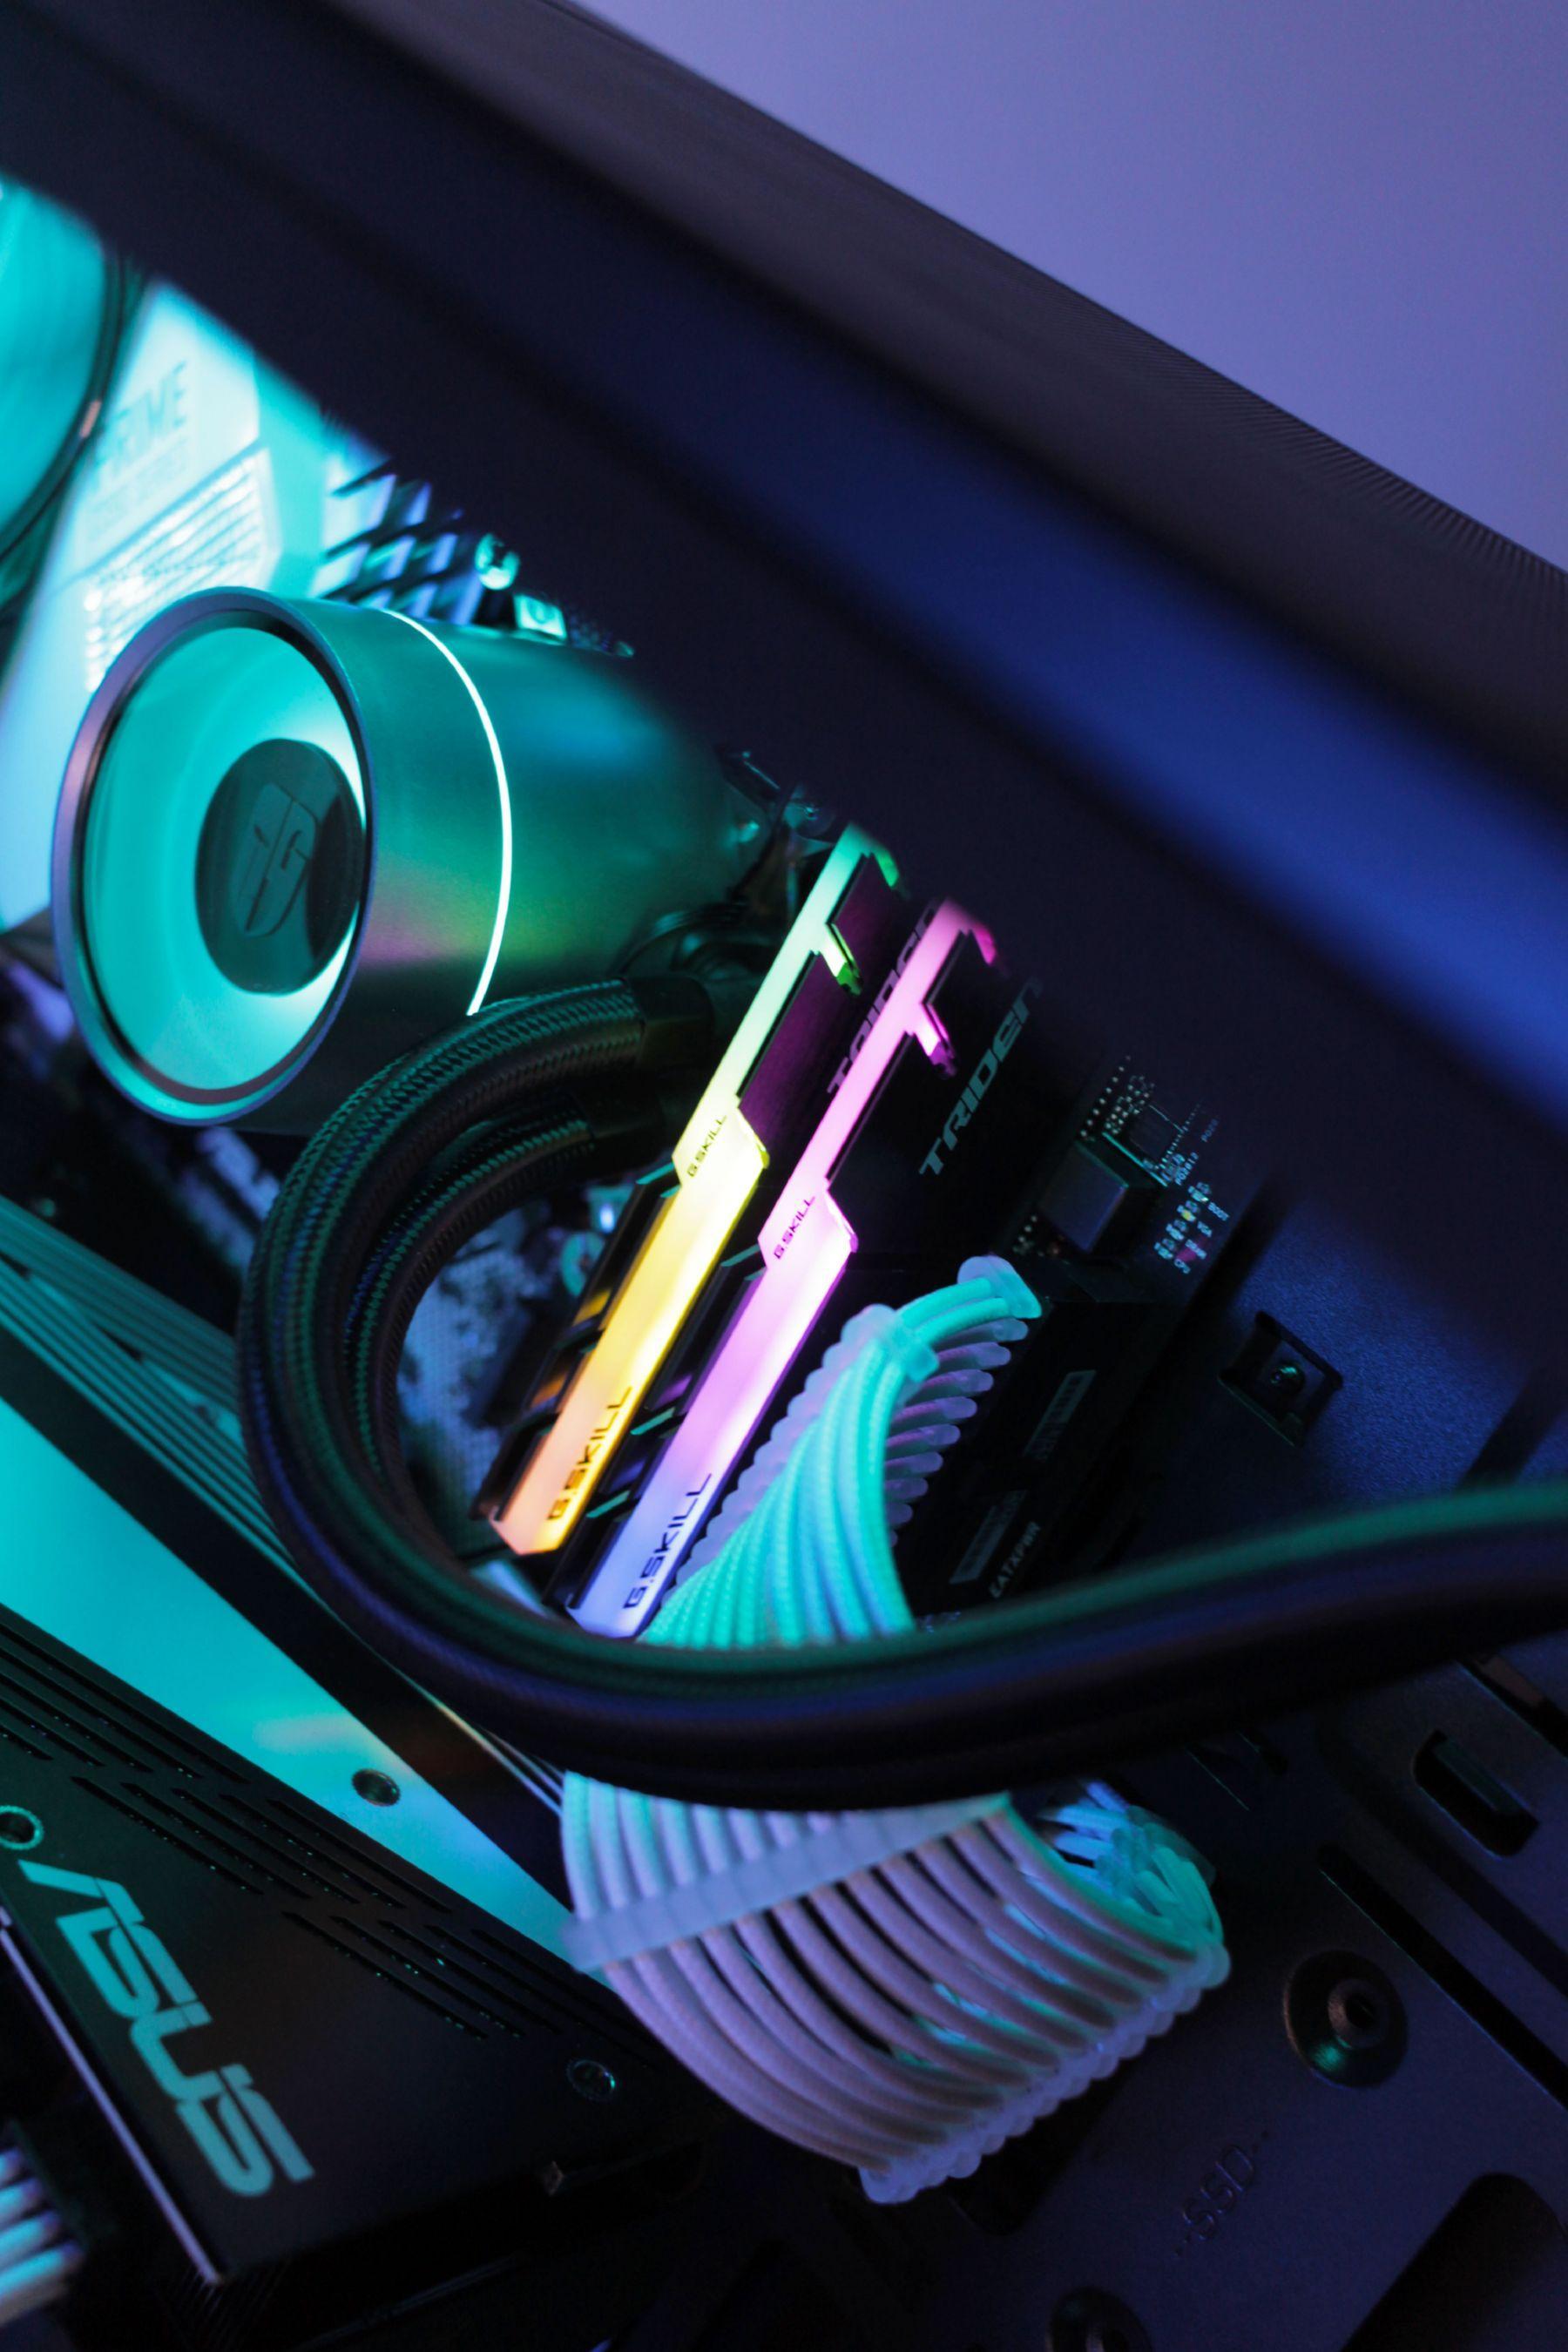 Centaur Gaming PC